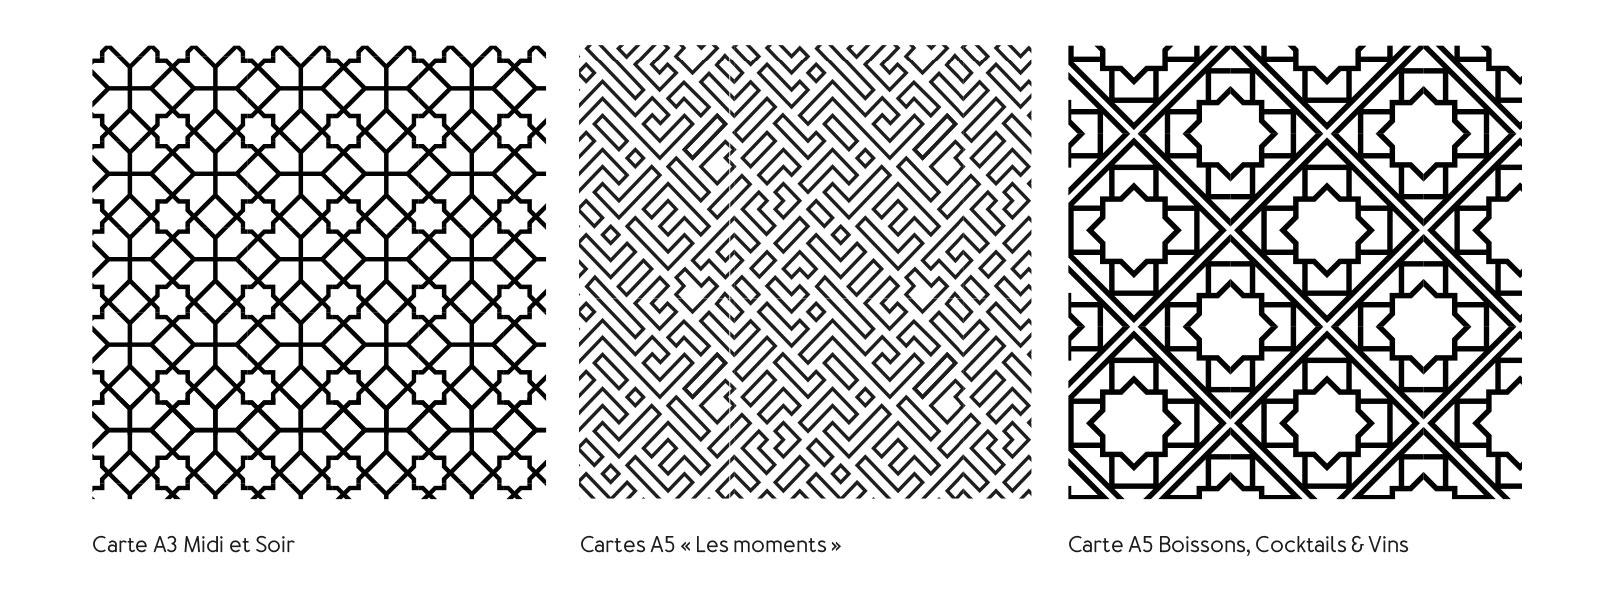 La Rotonde - Patterns